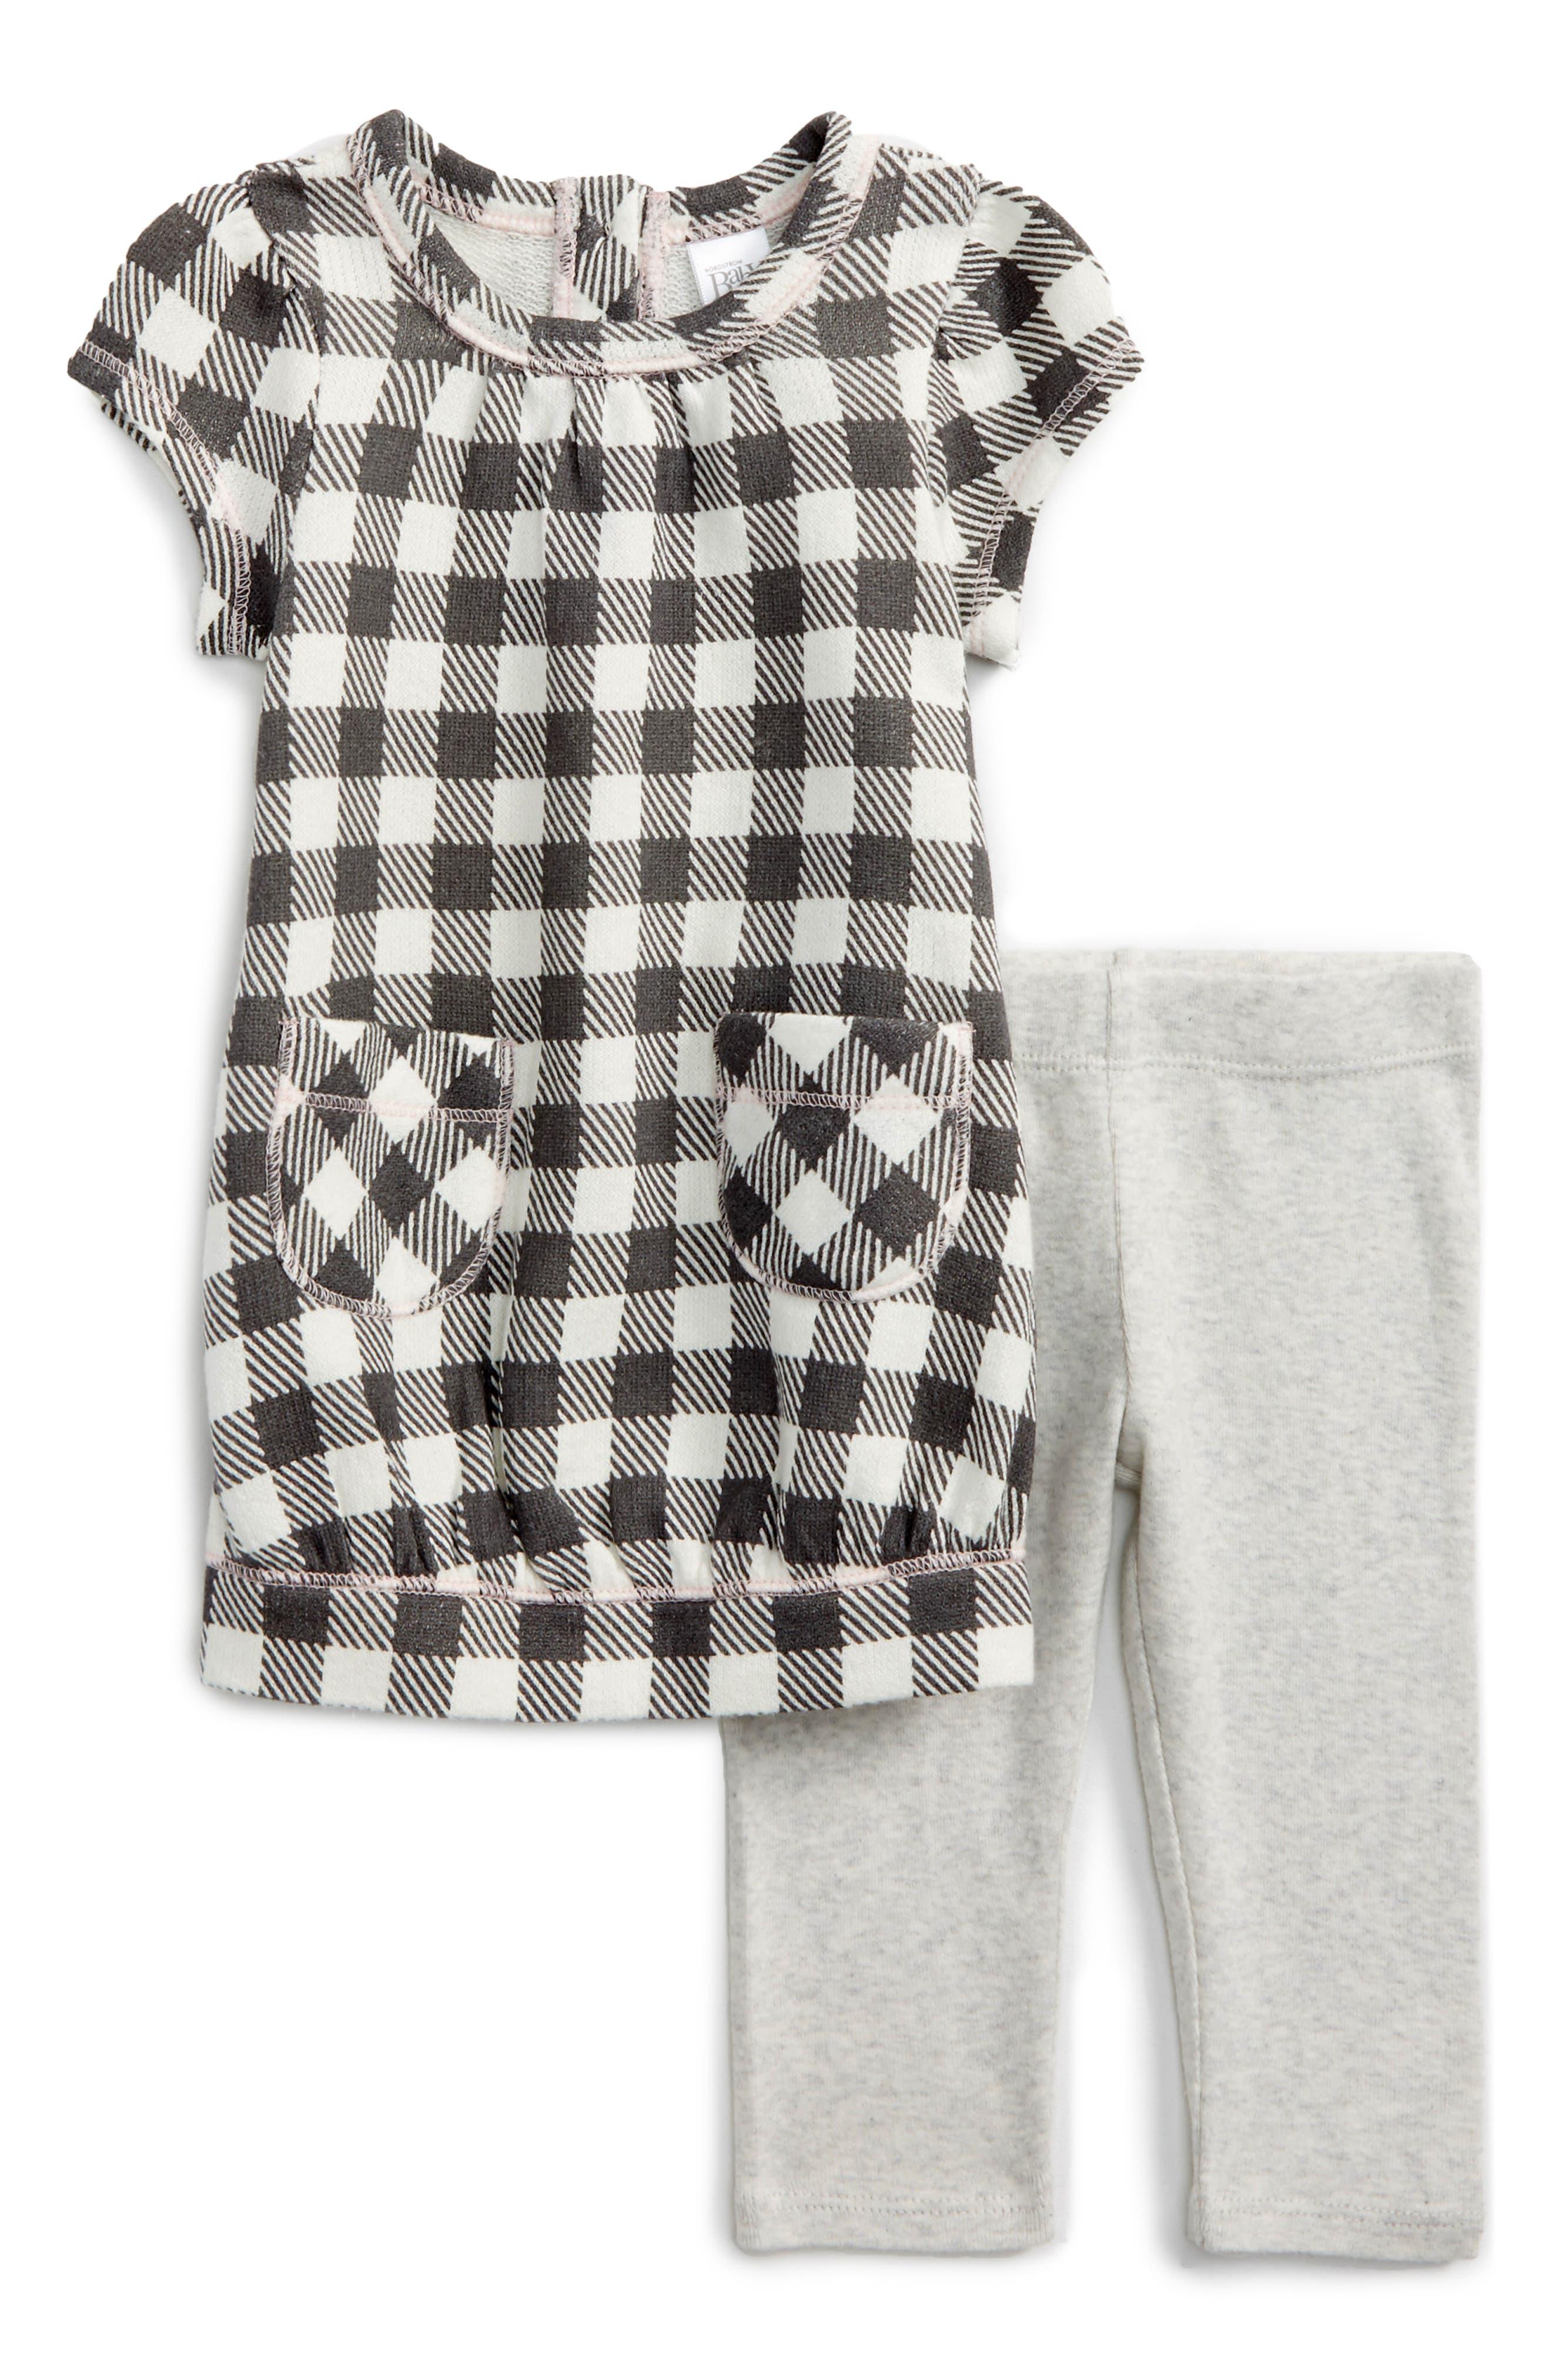 Main Image - Nordstrom Baby Check Print Dress & Solid Leggings Set (Baby Girls)